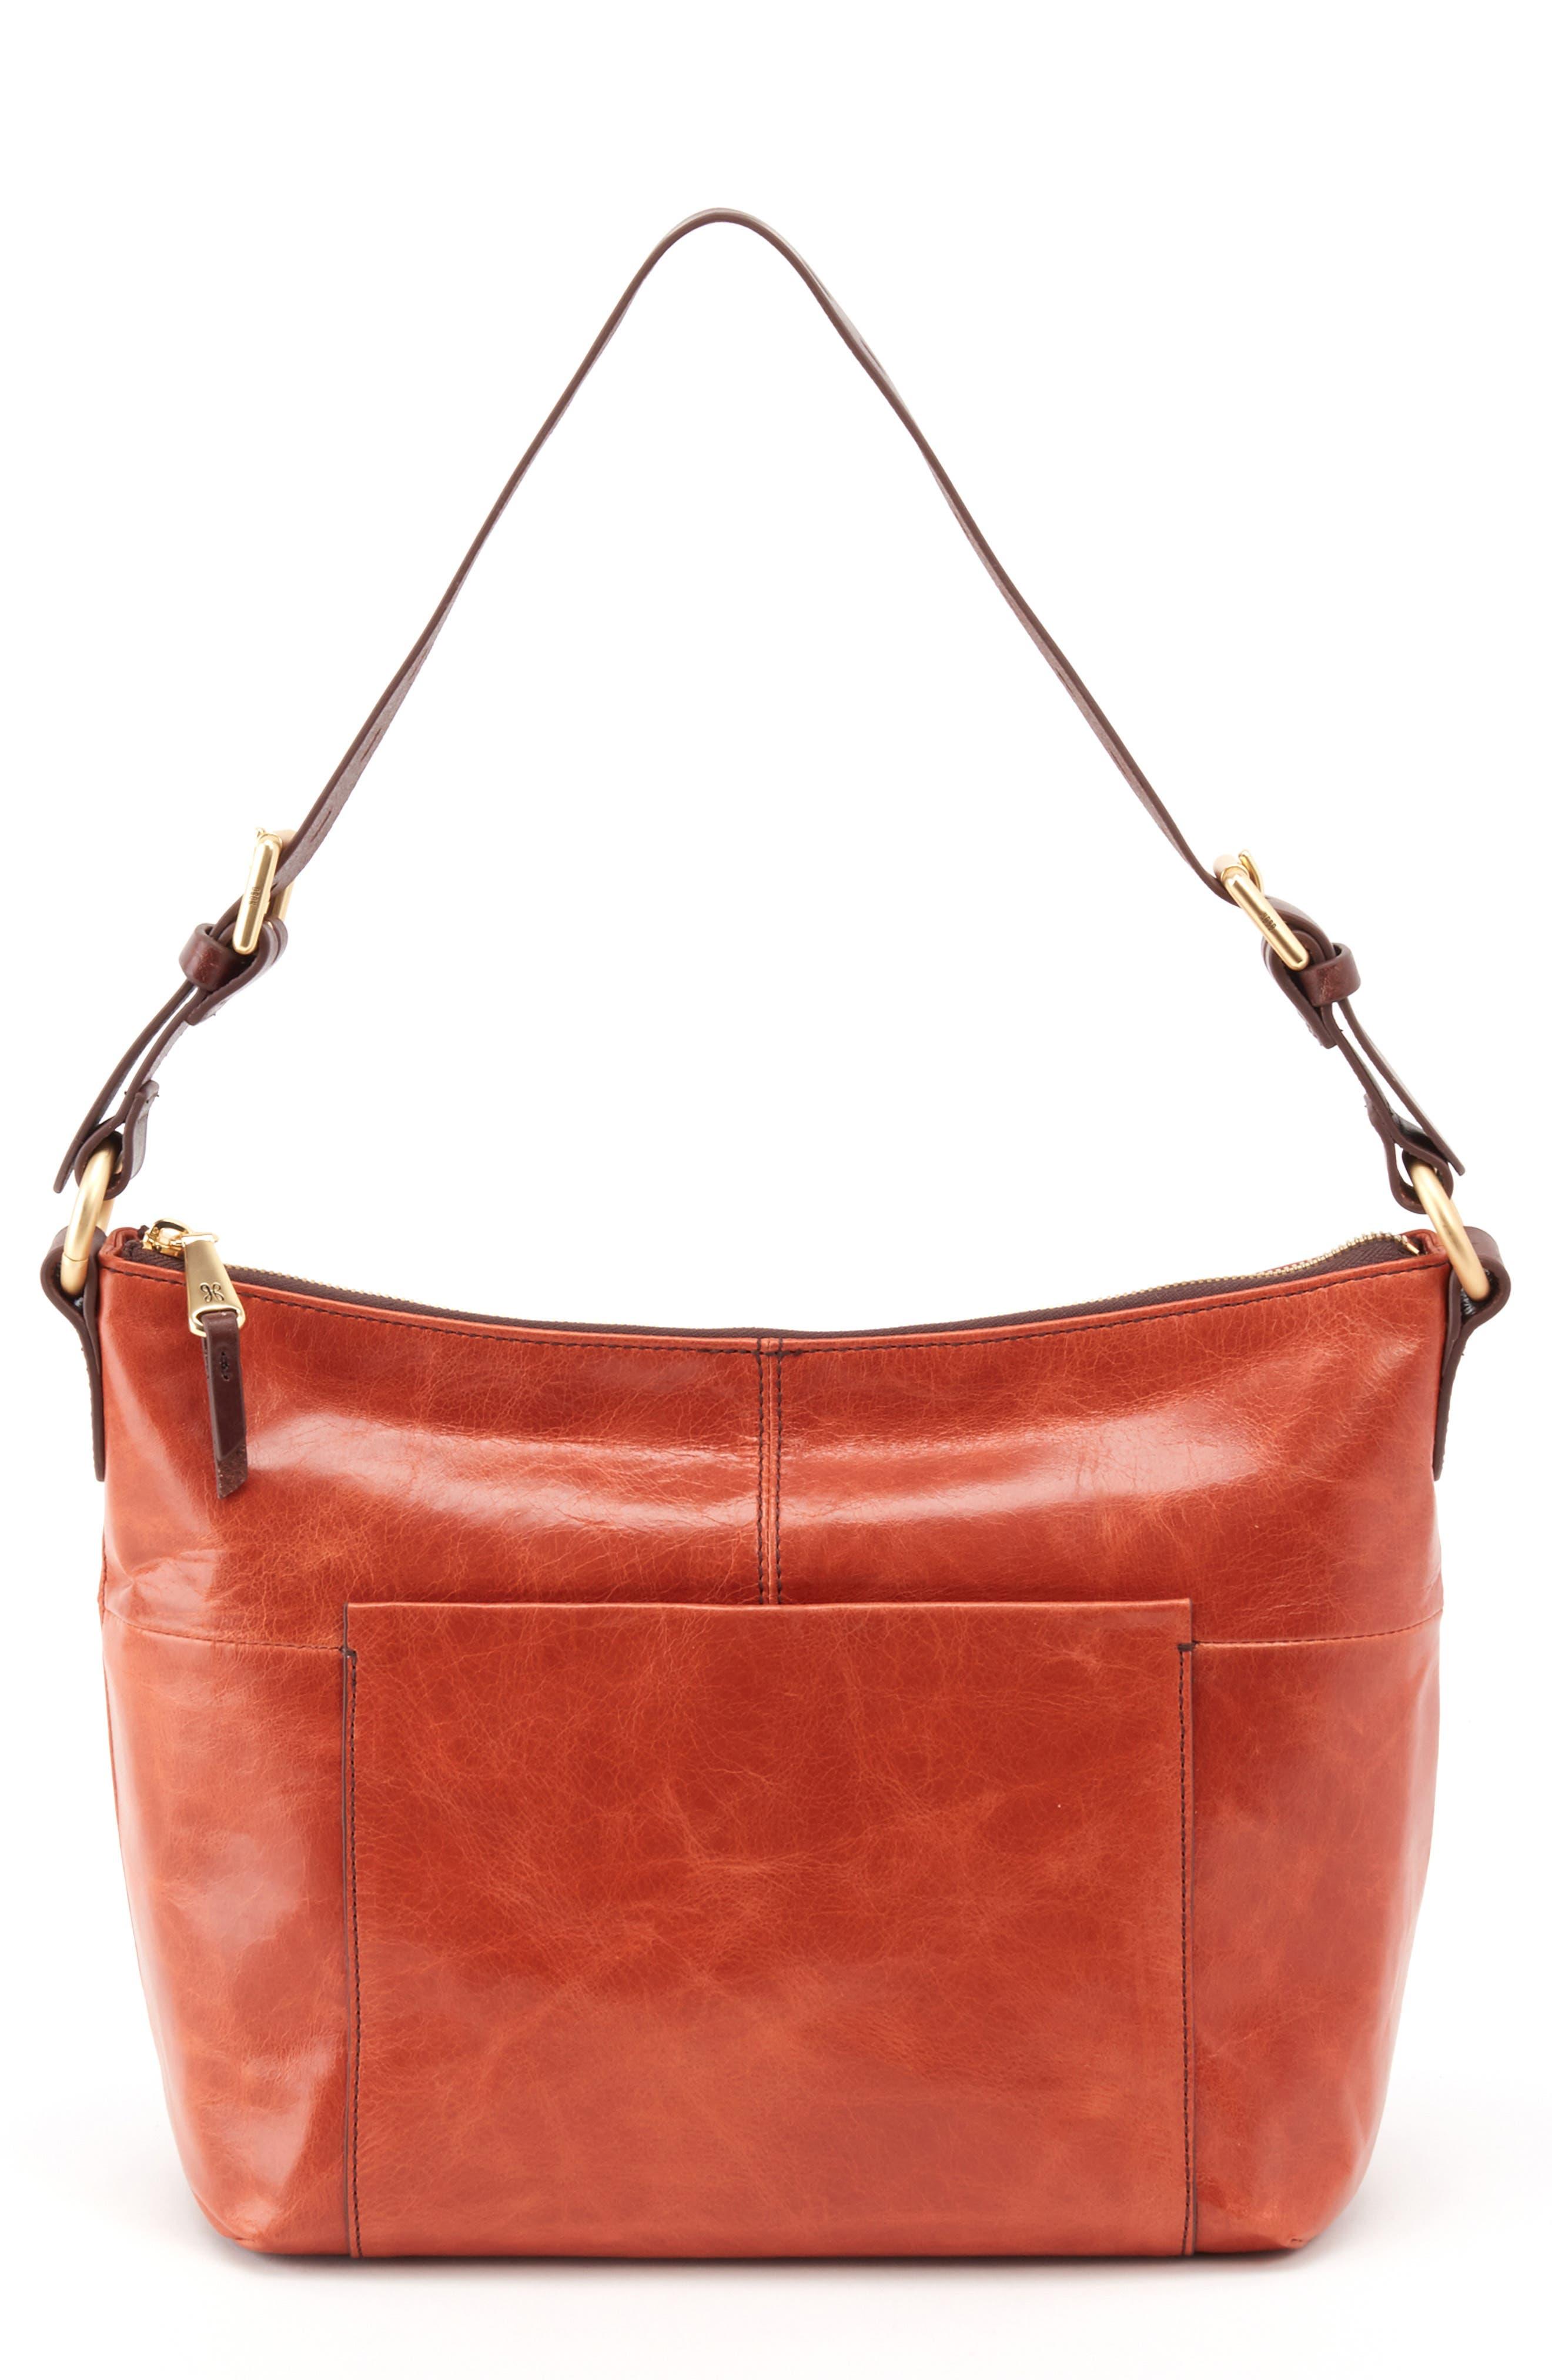 'Charlie' Leather Shoulder Bag,                         Main,                         color, Clay